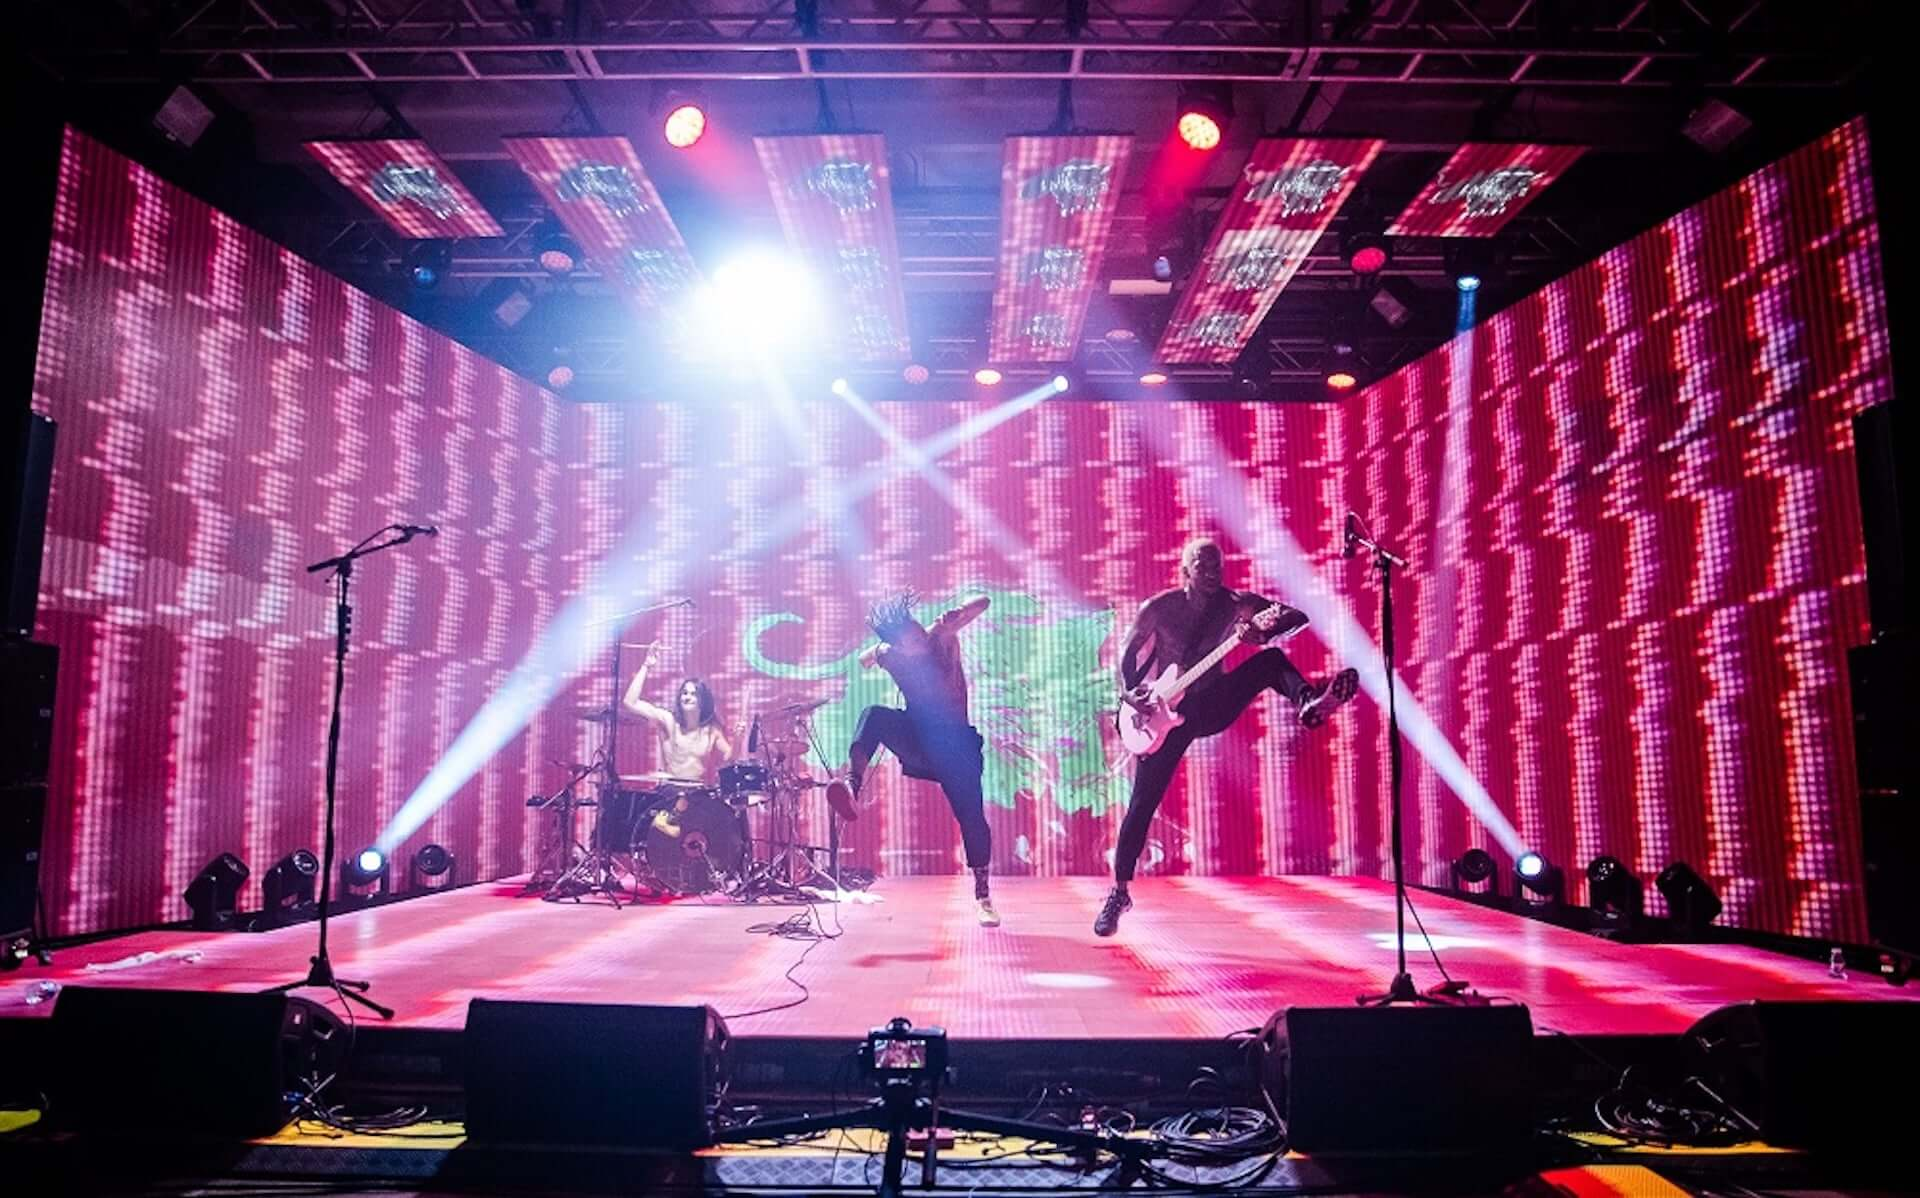 <FUJI ROCK FESTIVAL 2018>で初来日を果たしたFEVER 333が日本向けバーチャルライブツアーを明日開催!最新EPも配信中 music201026_fever333_5-1920x1198